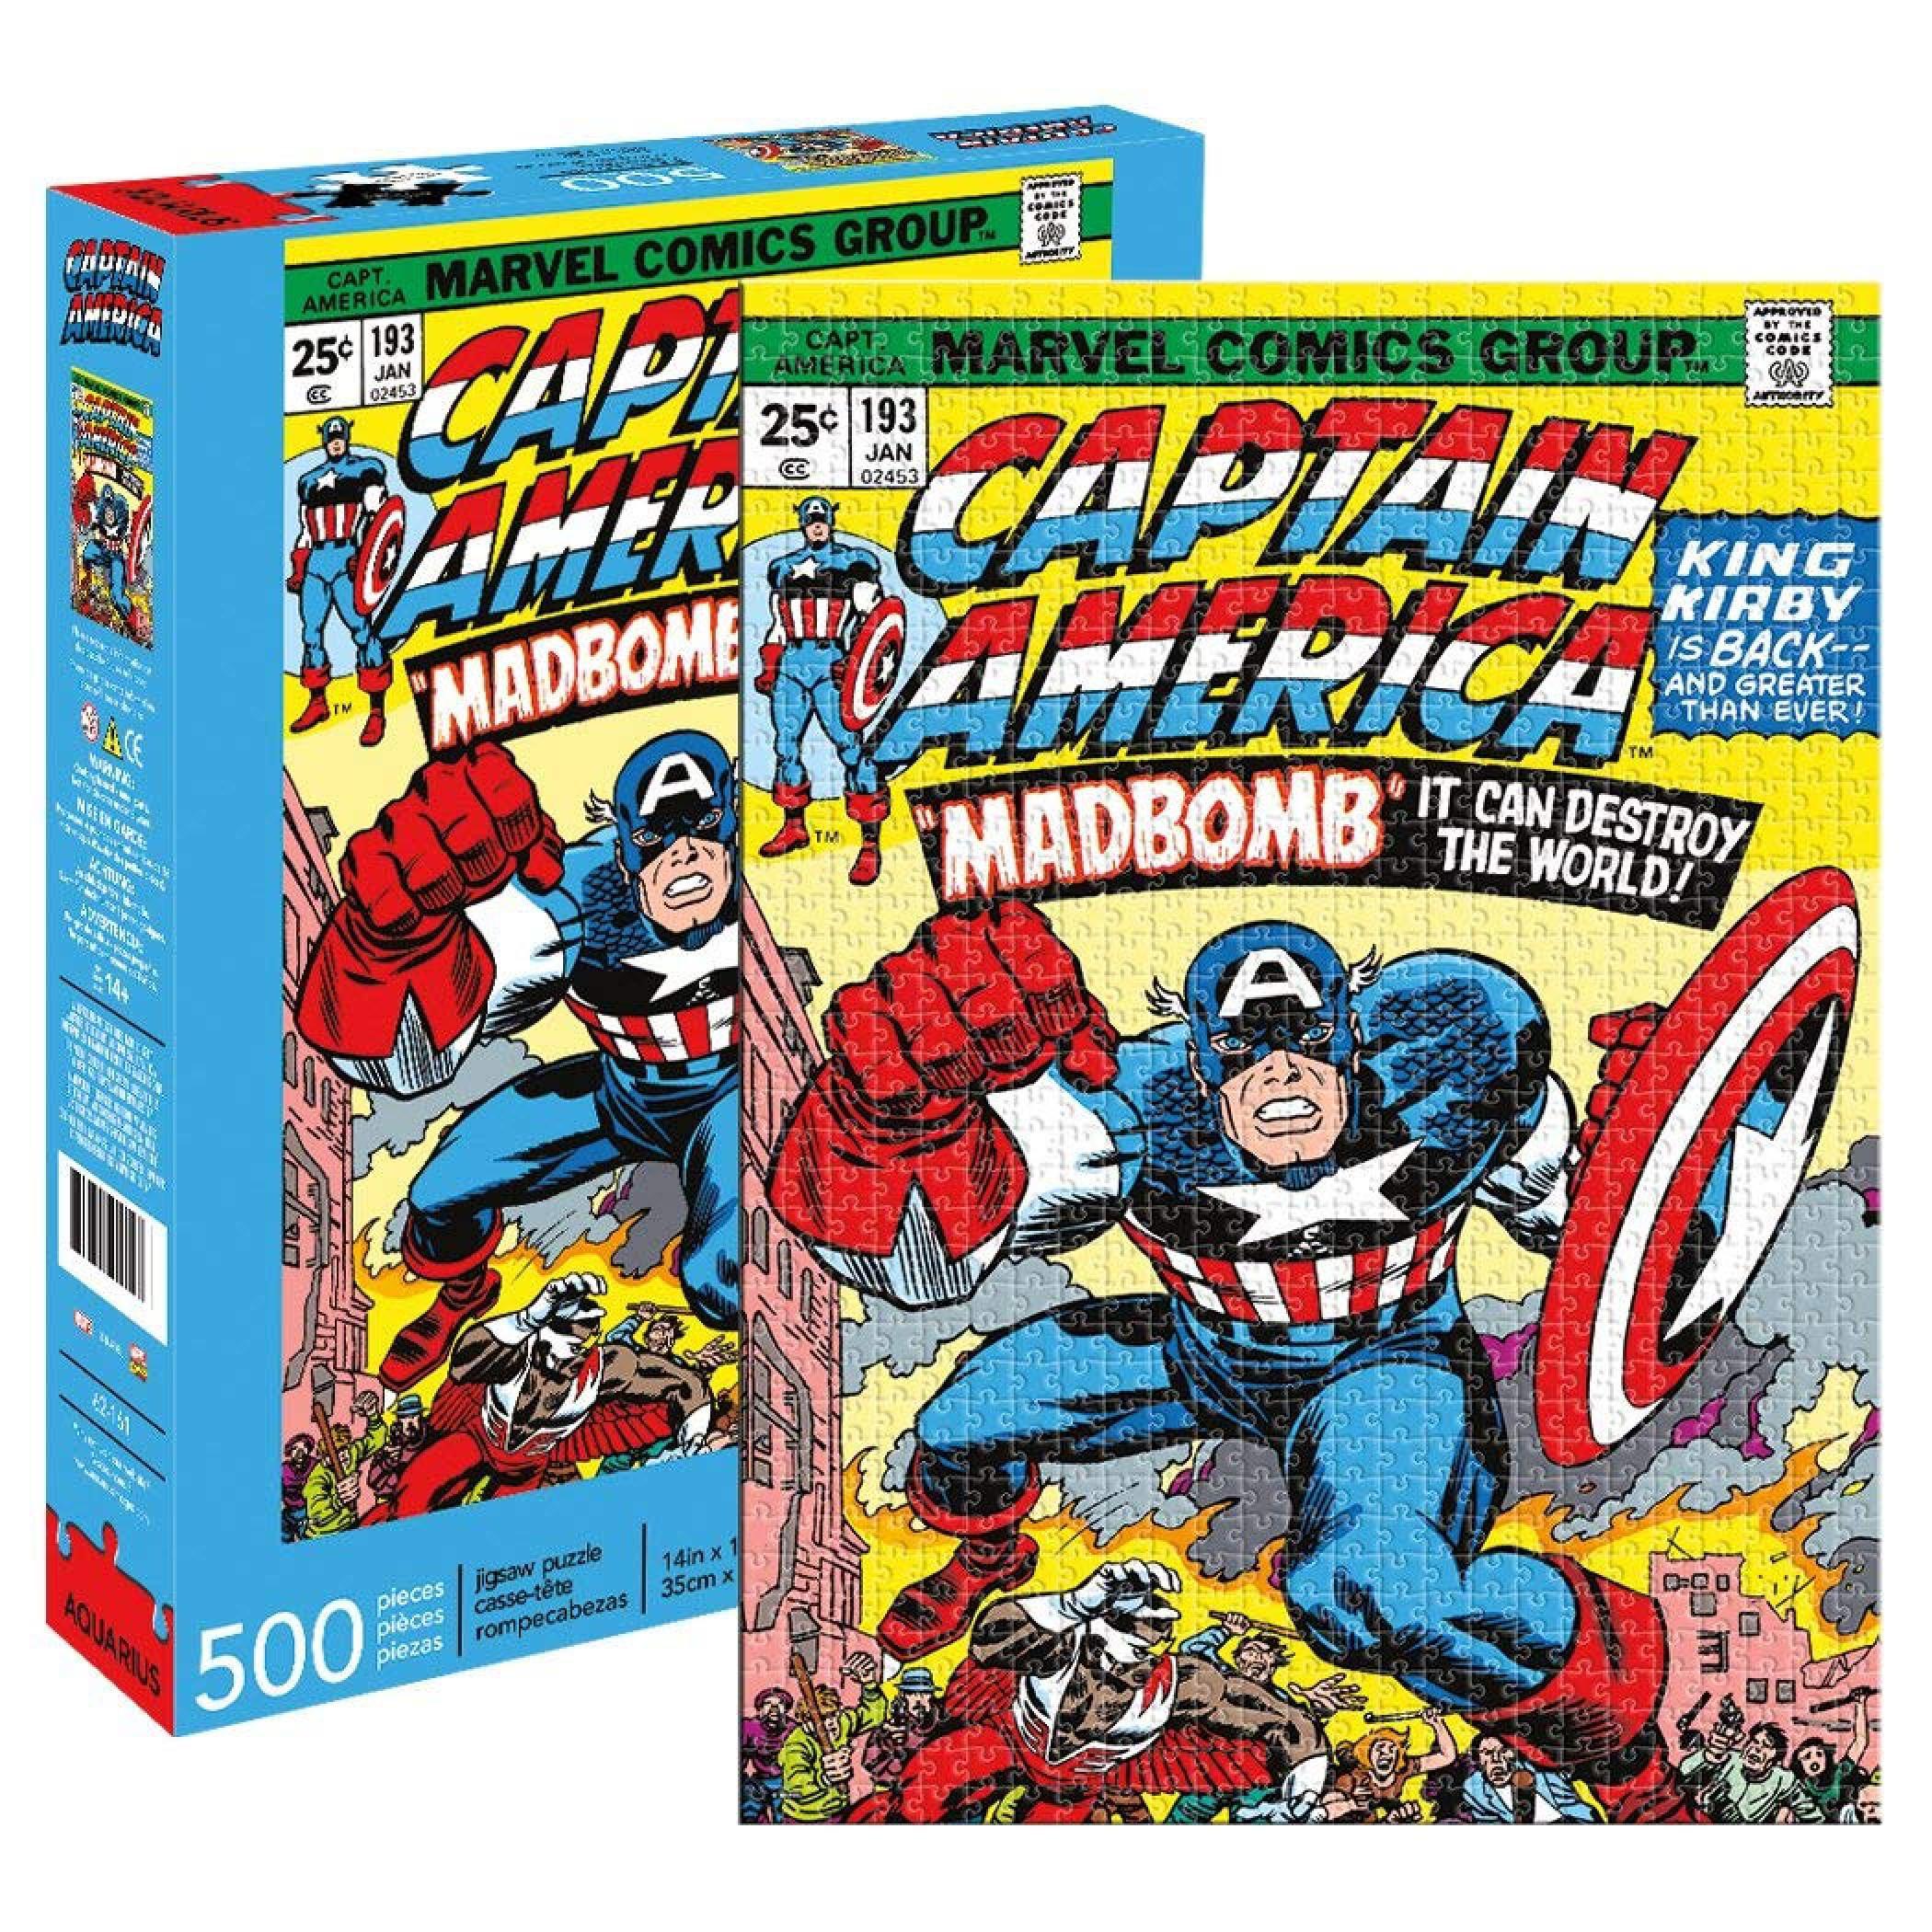 Captain America Mad Bomb Comic Cover 500 Piece Puzzle